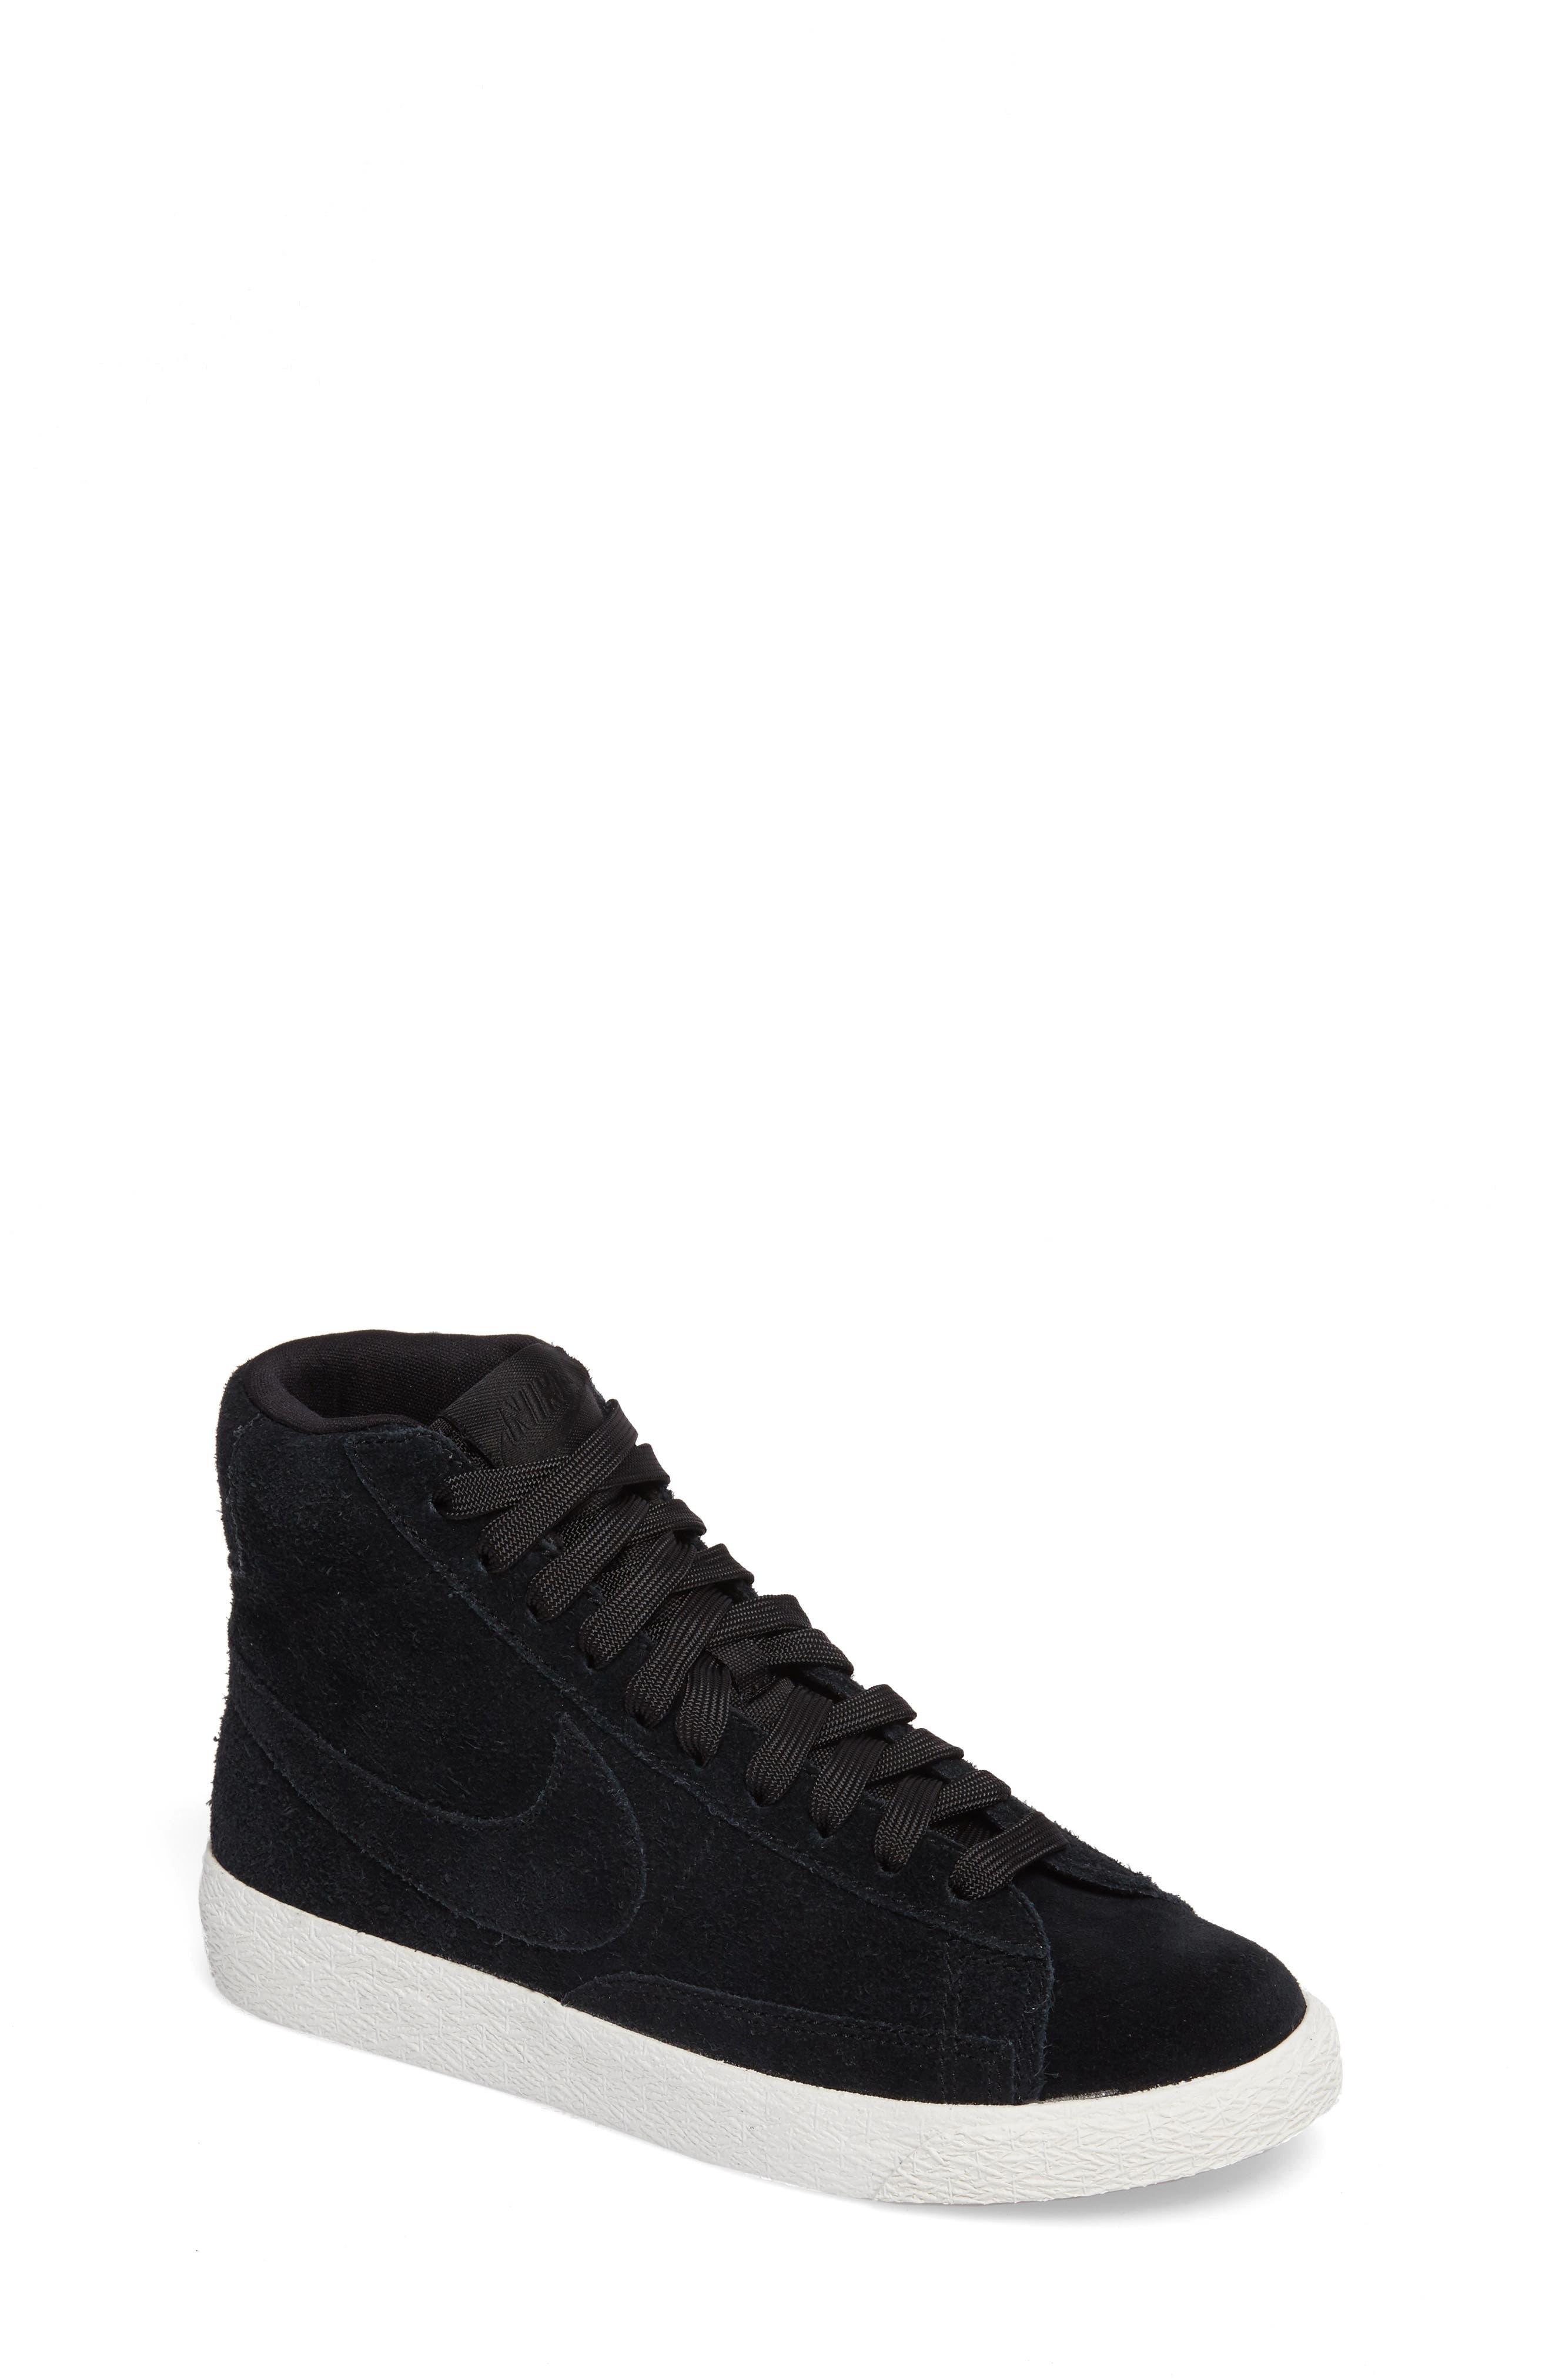 Blazer Mid High Top Sneaker,                             Main thumbnail 1, color,                             003